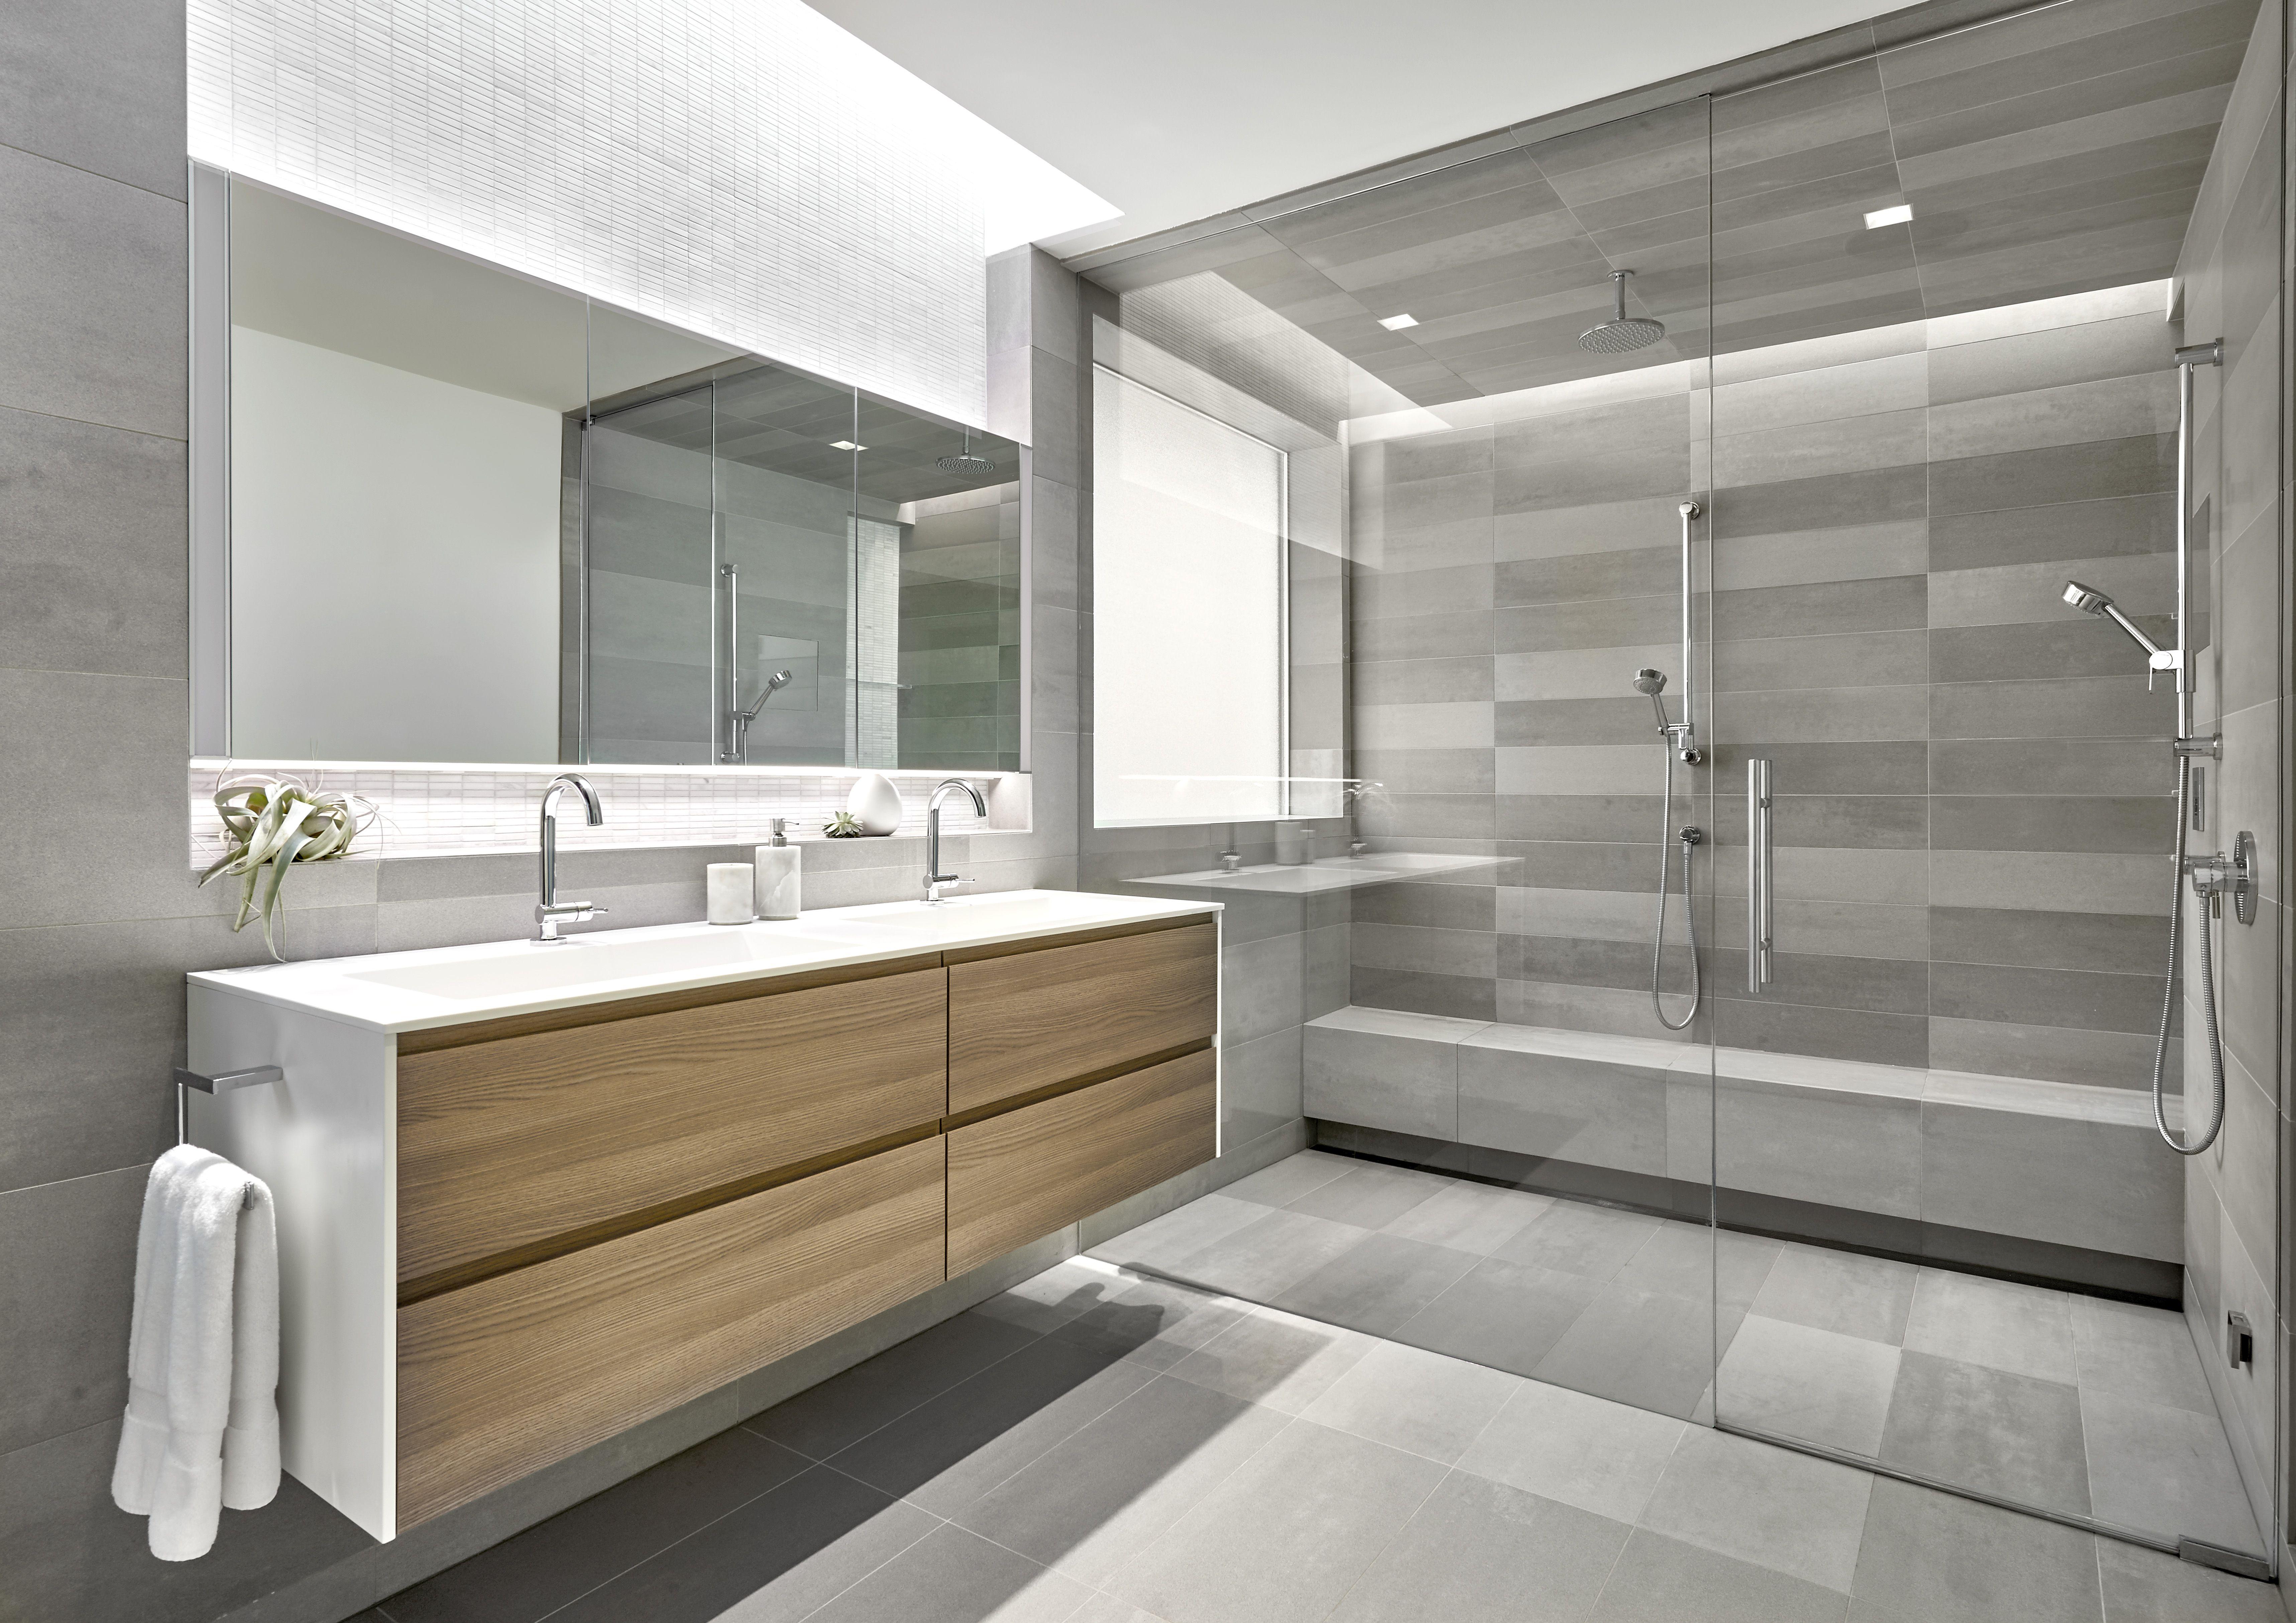 5 Tips On Buying The Best Bathroom Suites Bathroom Tile Designs